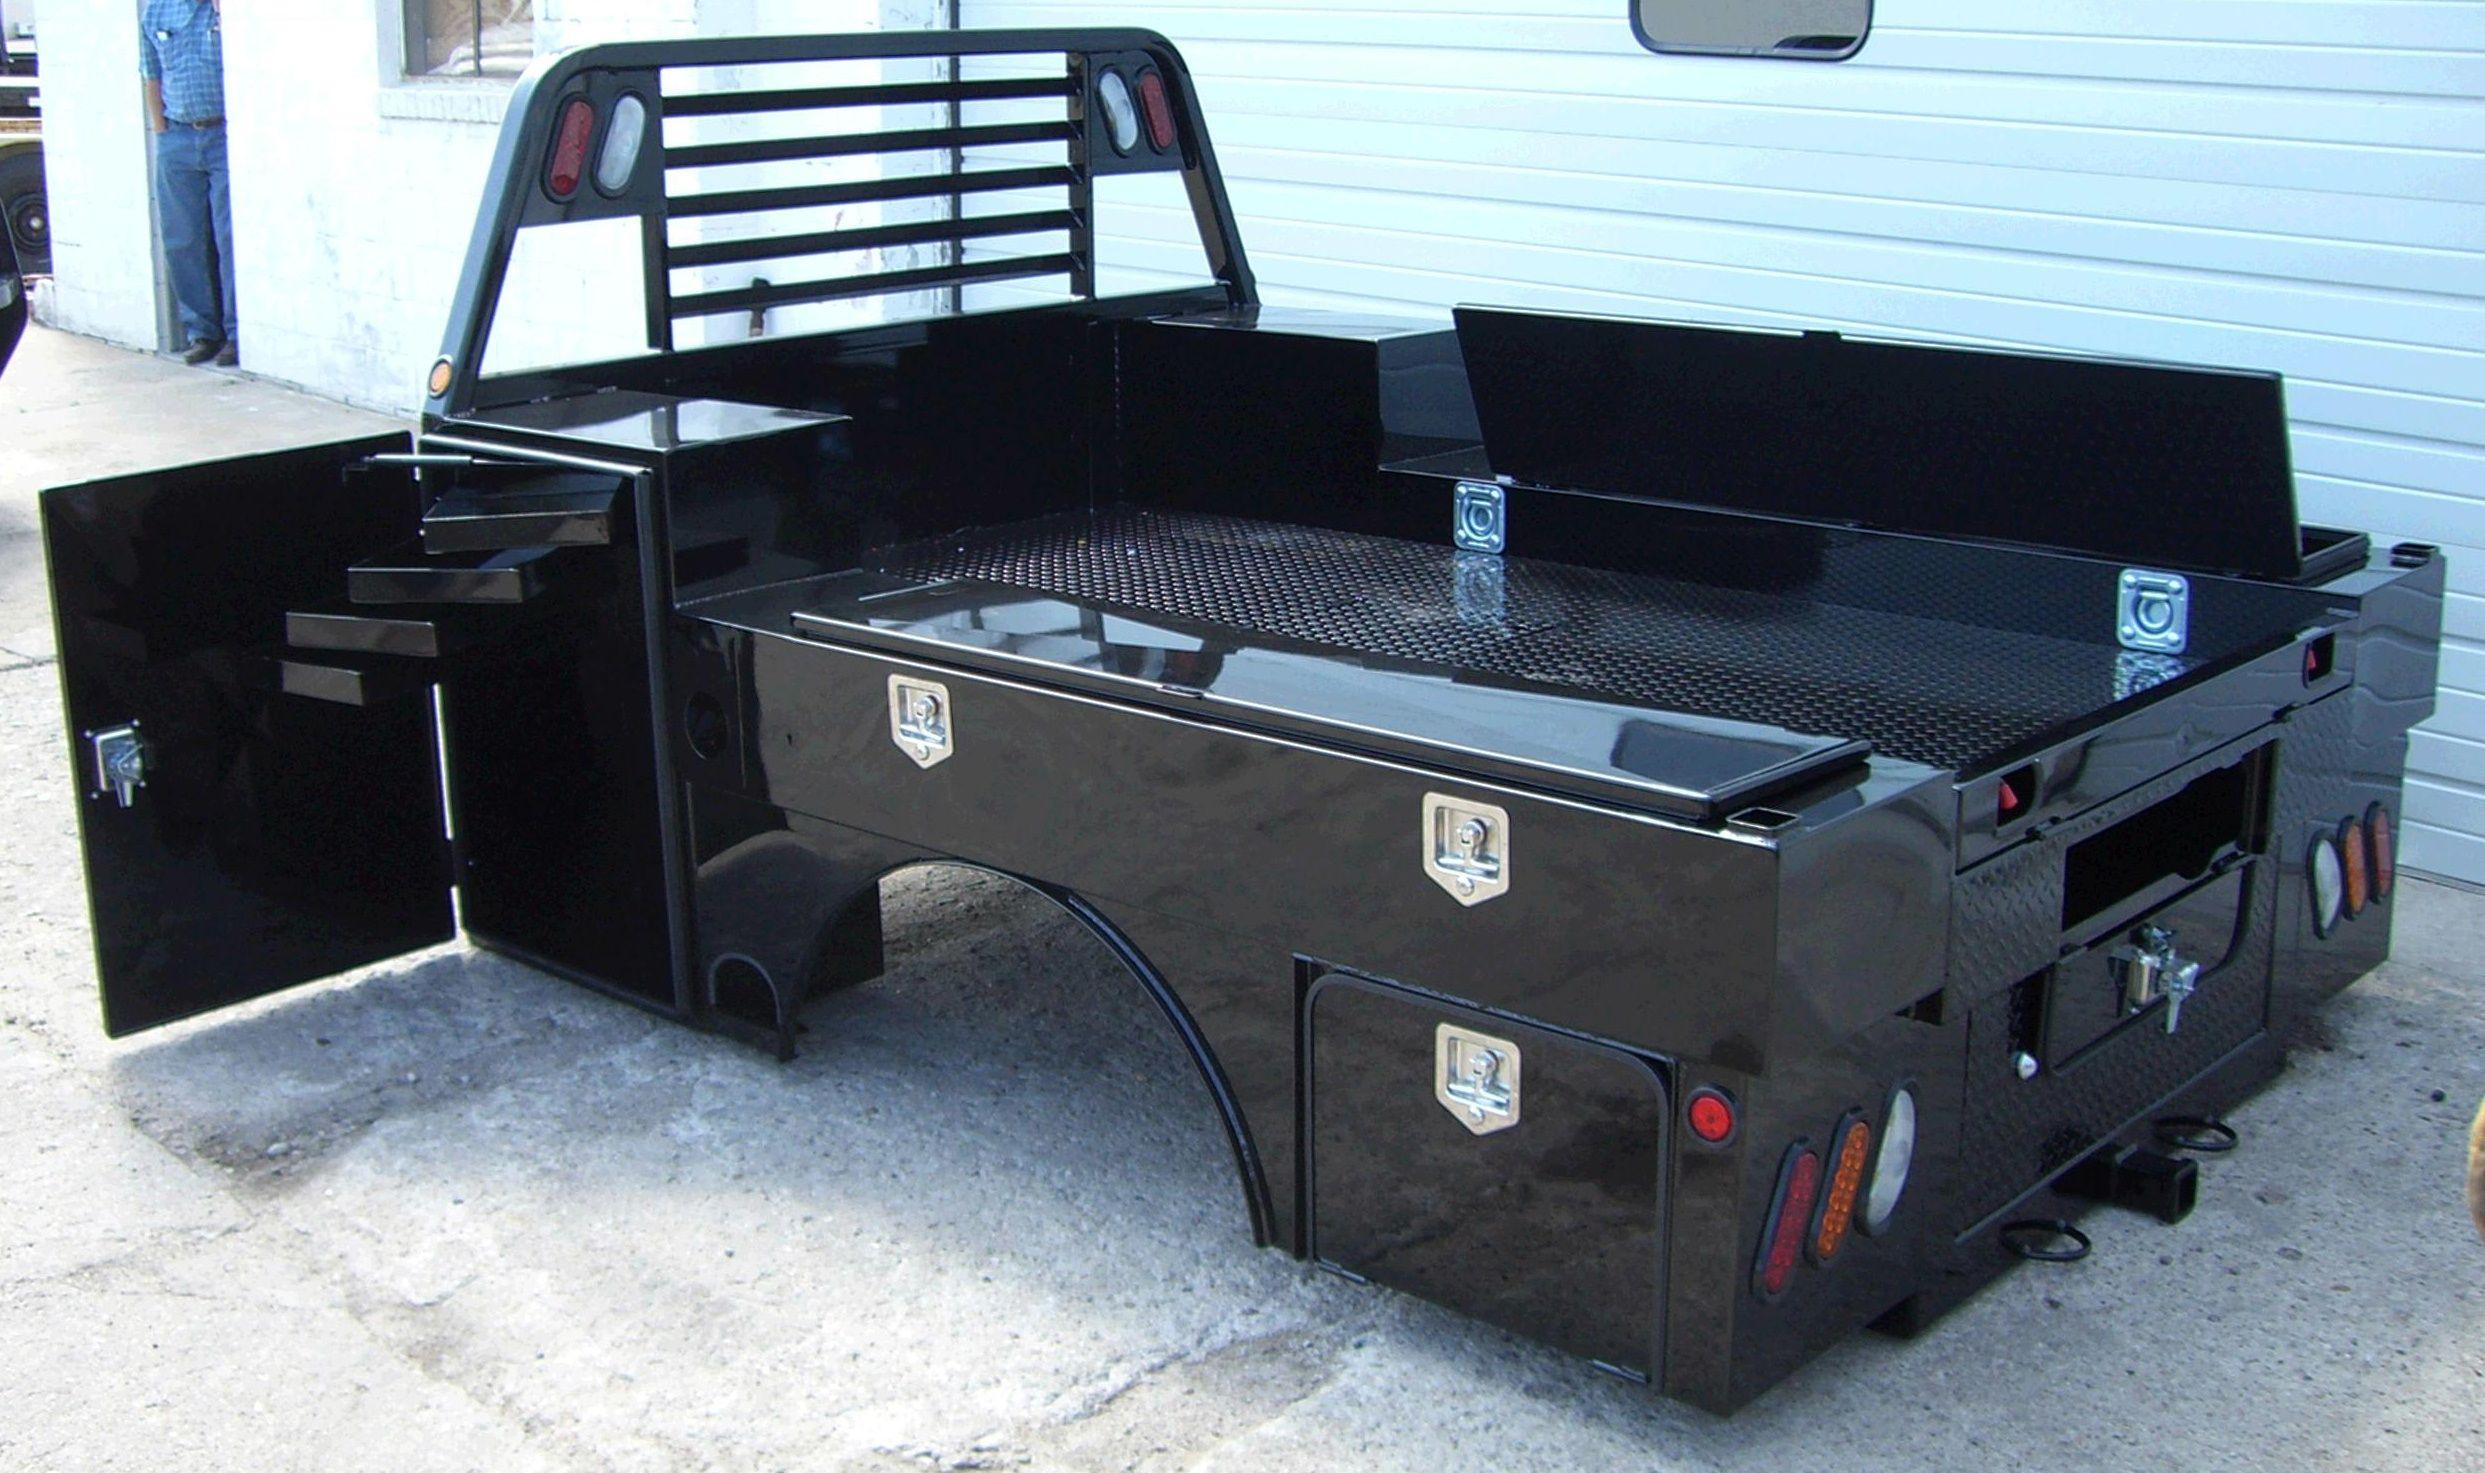 Gmc Accessories Amarillo >> 8700UT.JPG (2485×1473) | dually truck | Pinterest | Truck bed, Vehicle and Welding trucks